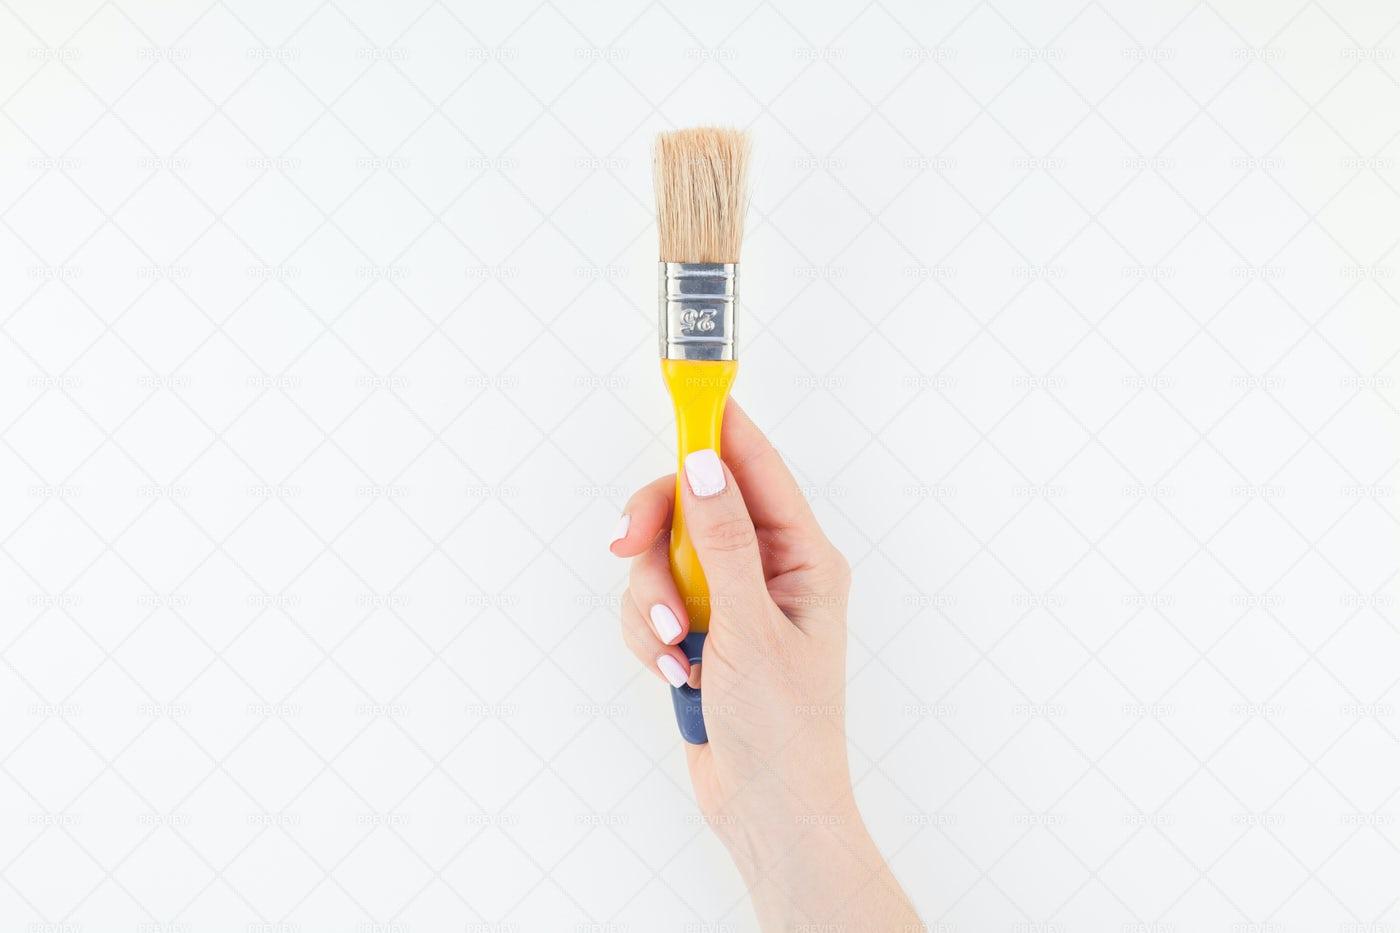 Hand Holding Paint Brush: Stock Photos